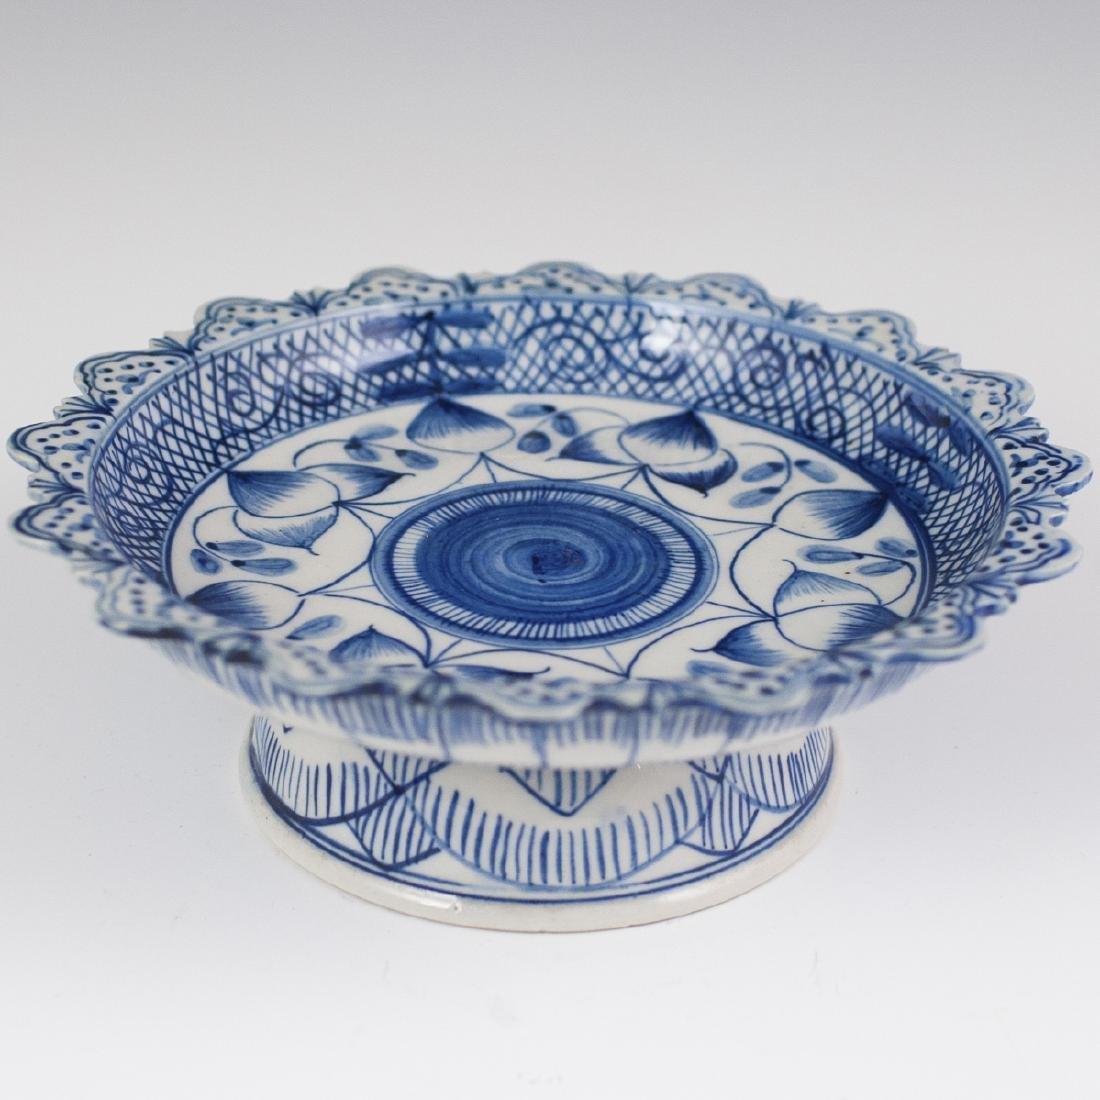 Antique Chinese Blue & White Porcelain Stem Bowl